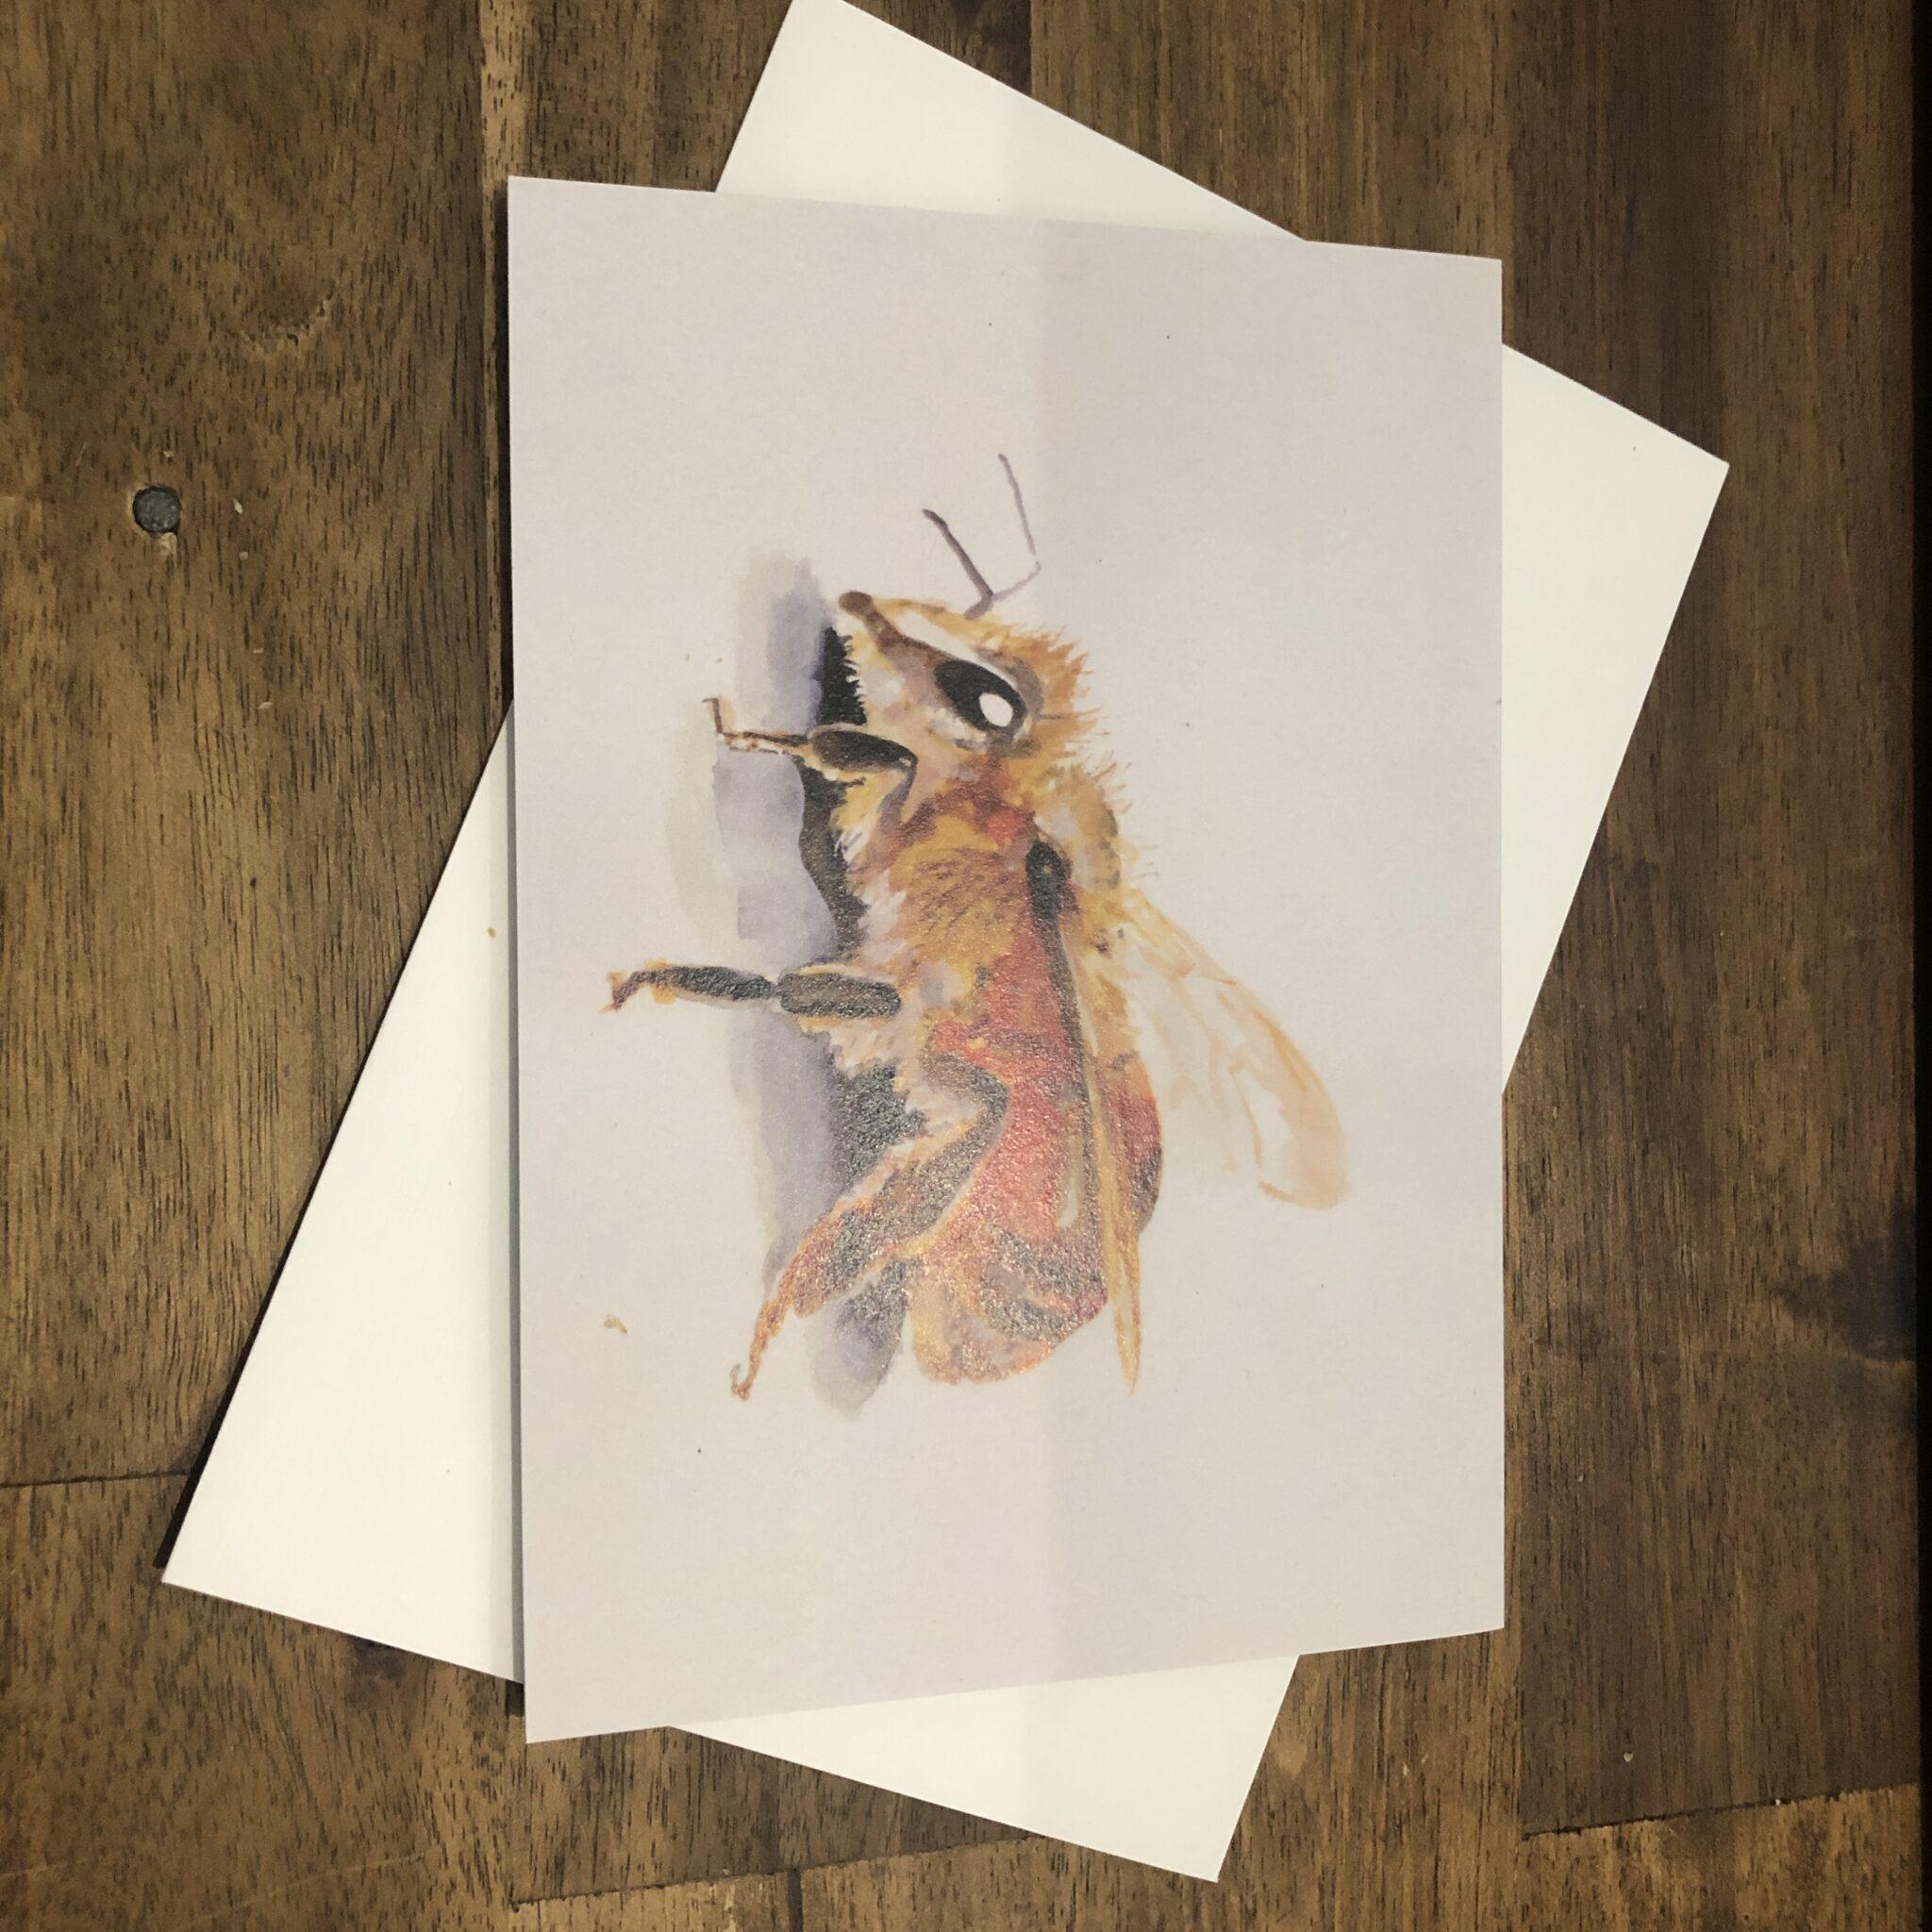 Honey Bee Greeting Card By Skye O'Shea (Prahran)